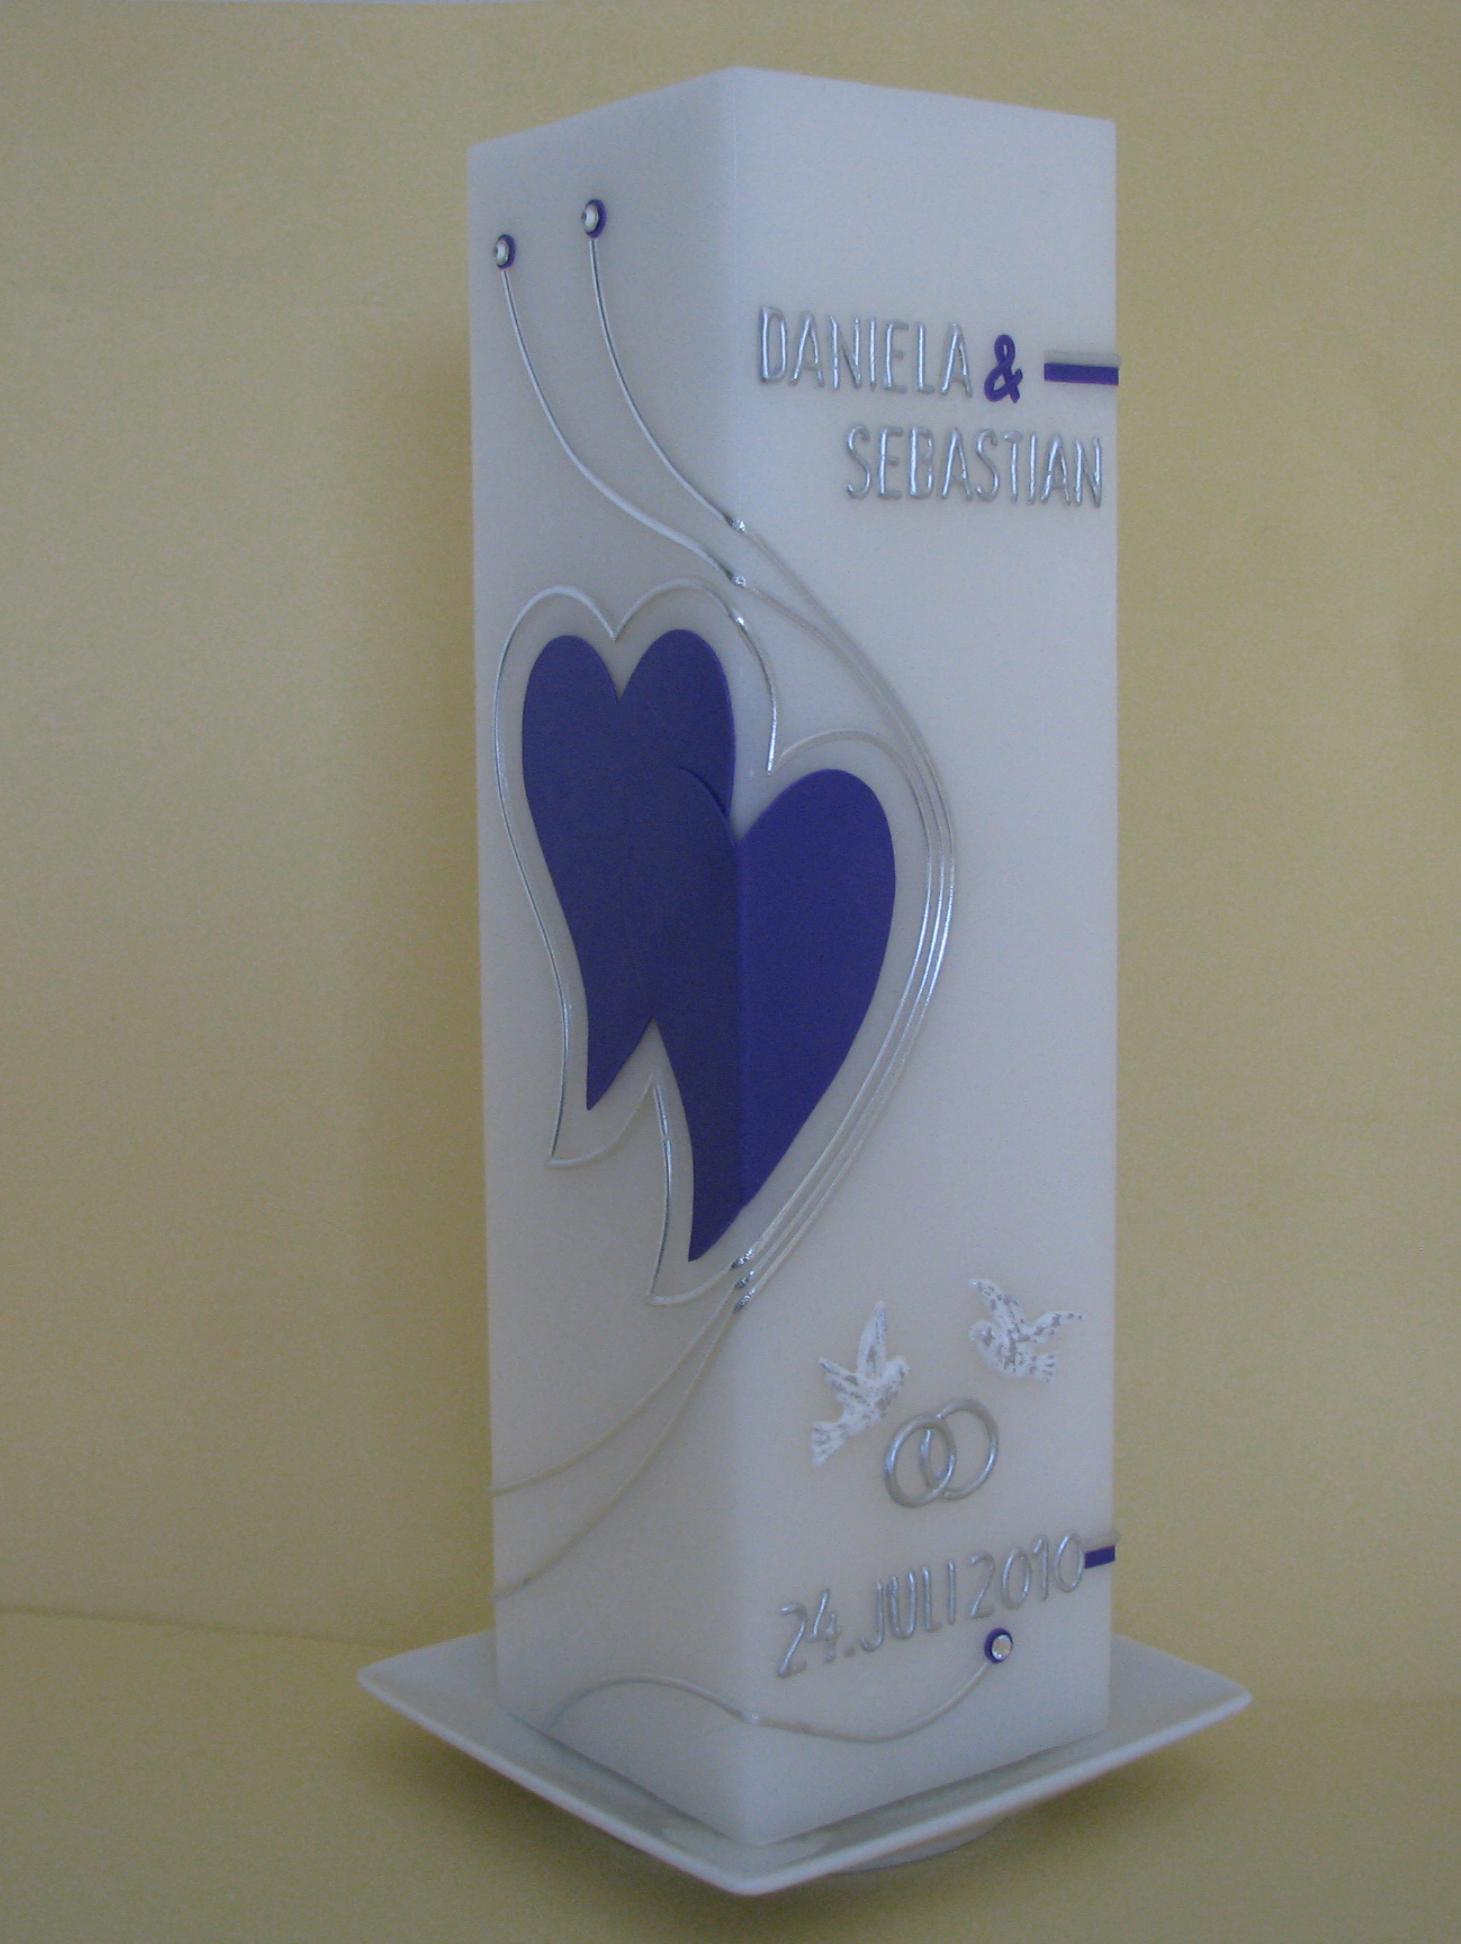 HE-0054, quadratisch, HxB ca 24 cm x 7,5 cm, Preis ca. € 39,--